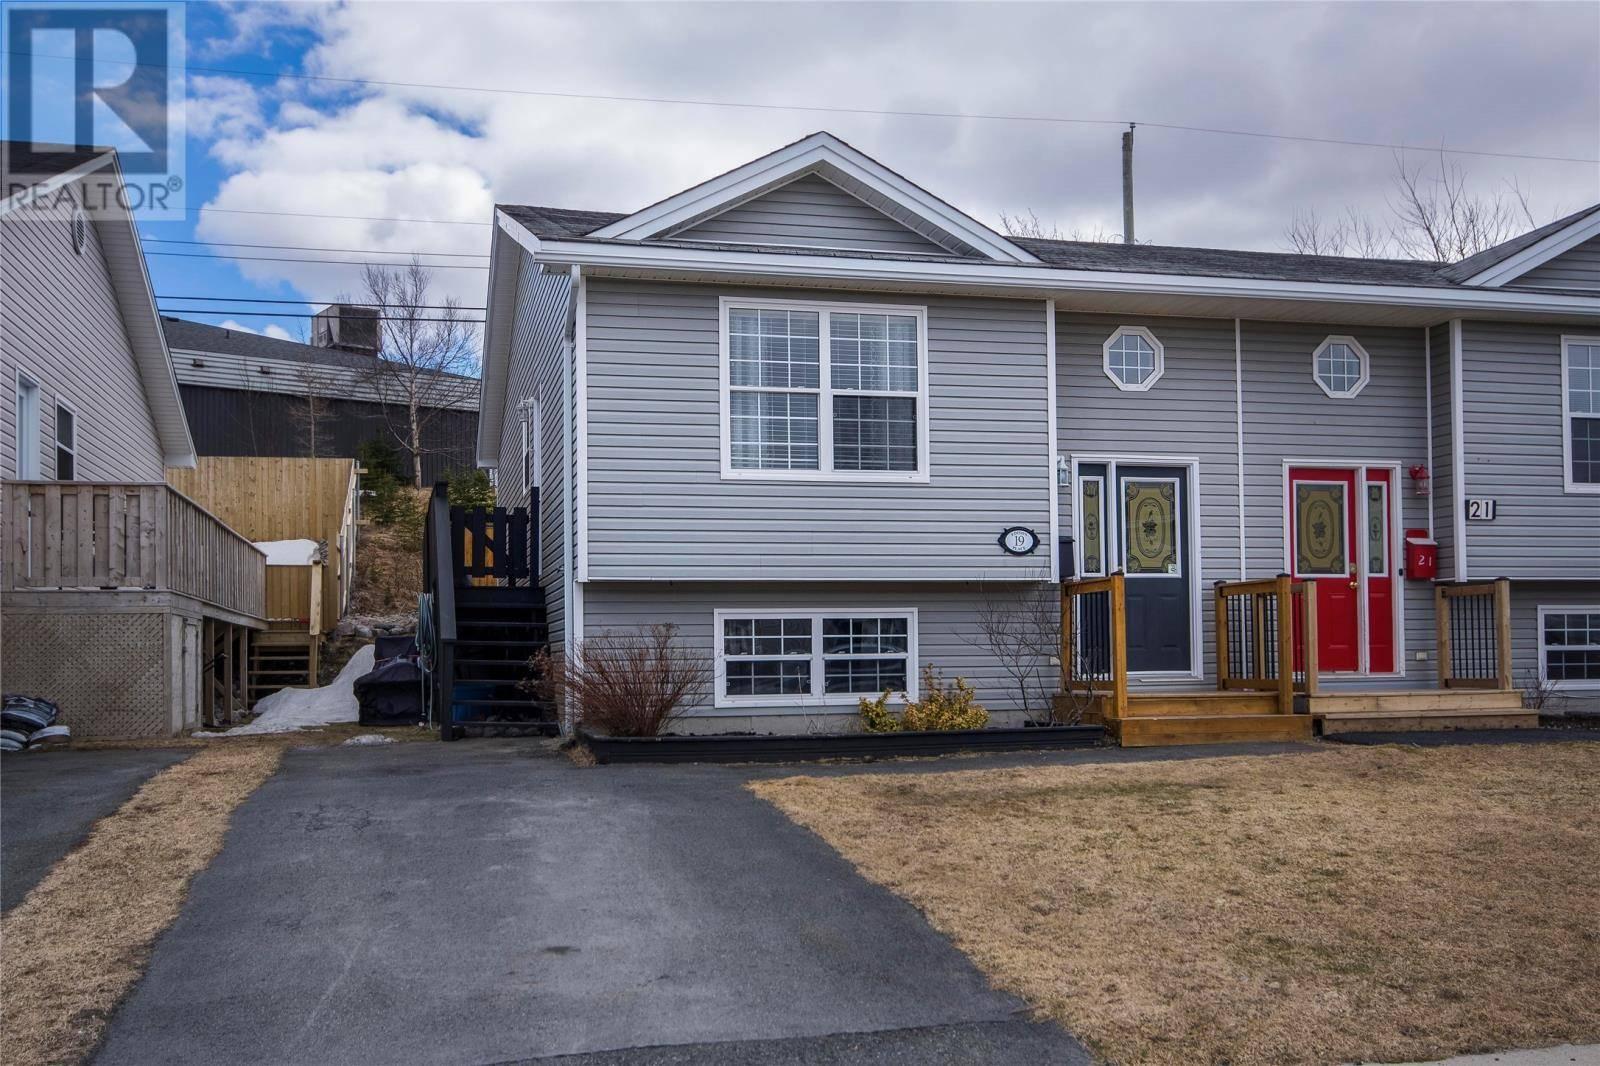 House for sale at 19 Edison Pl St. John's Newfoundland - MLS: 1205220